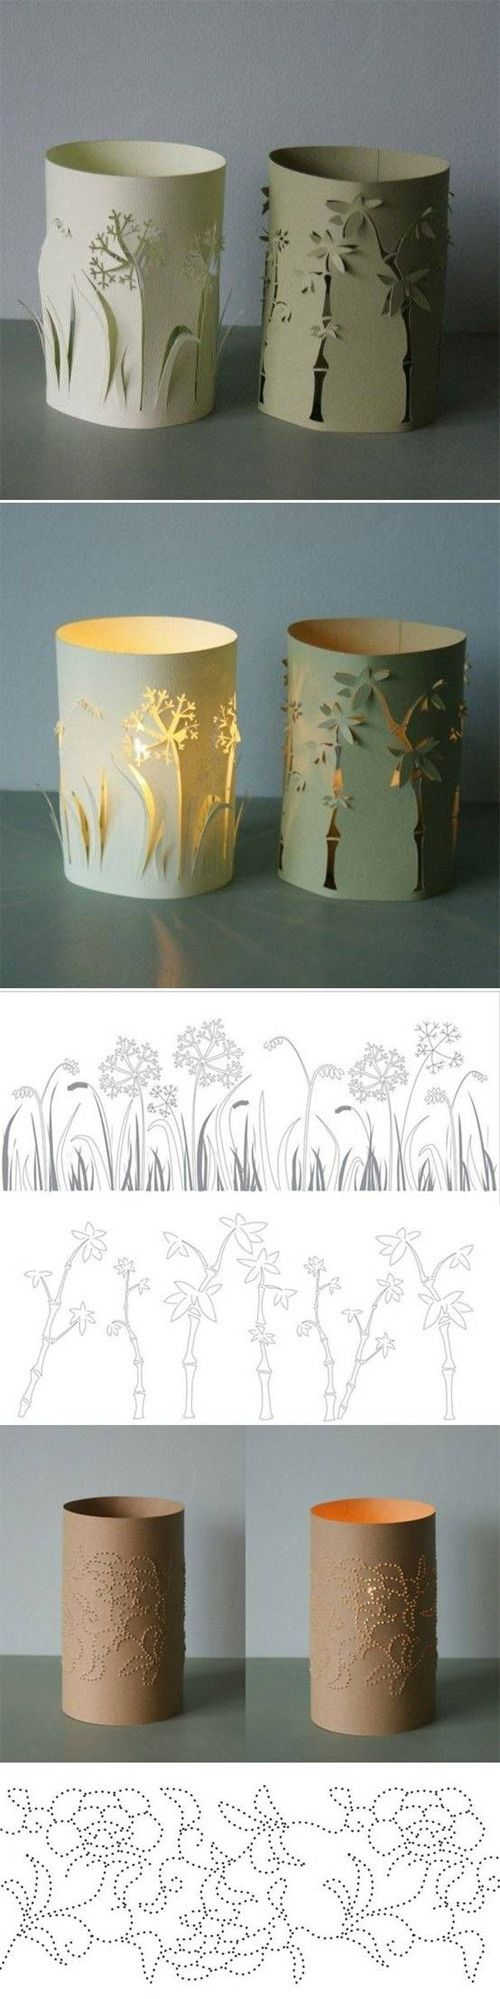 DIY Paper Candlestick Pattern